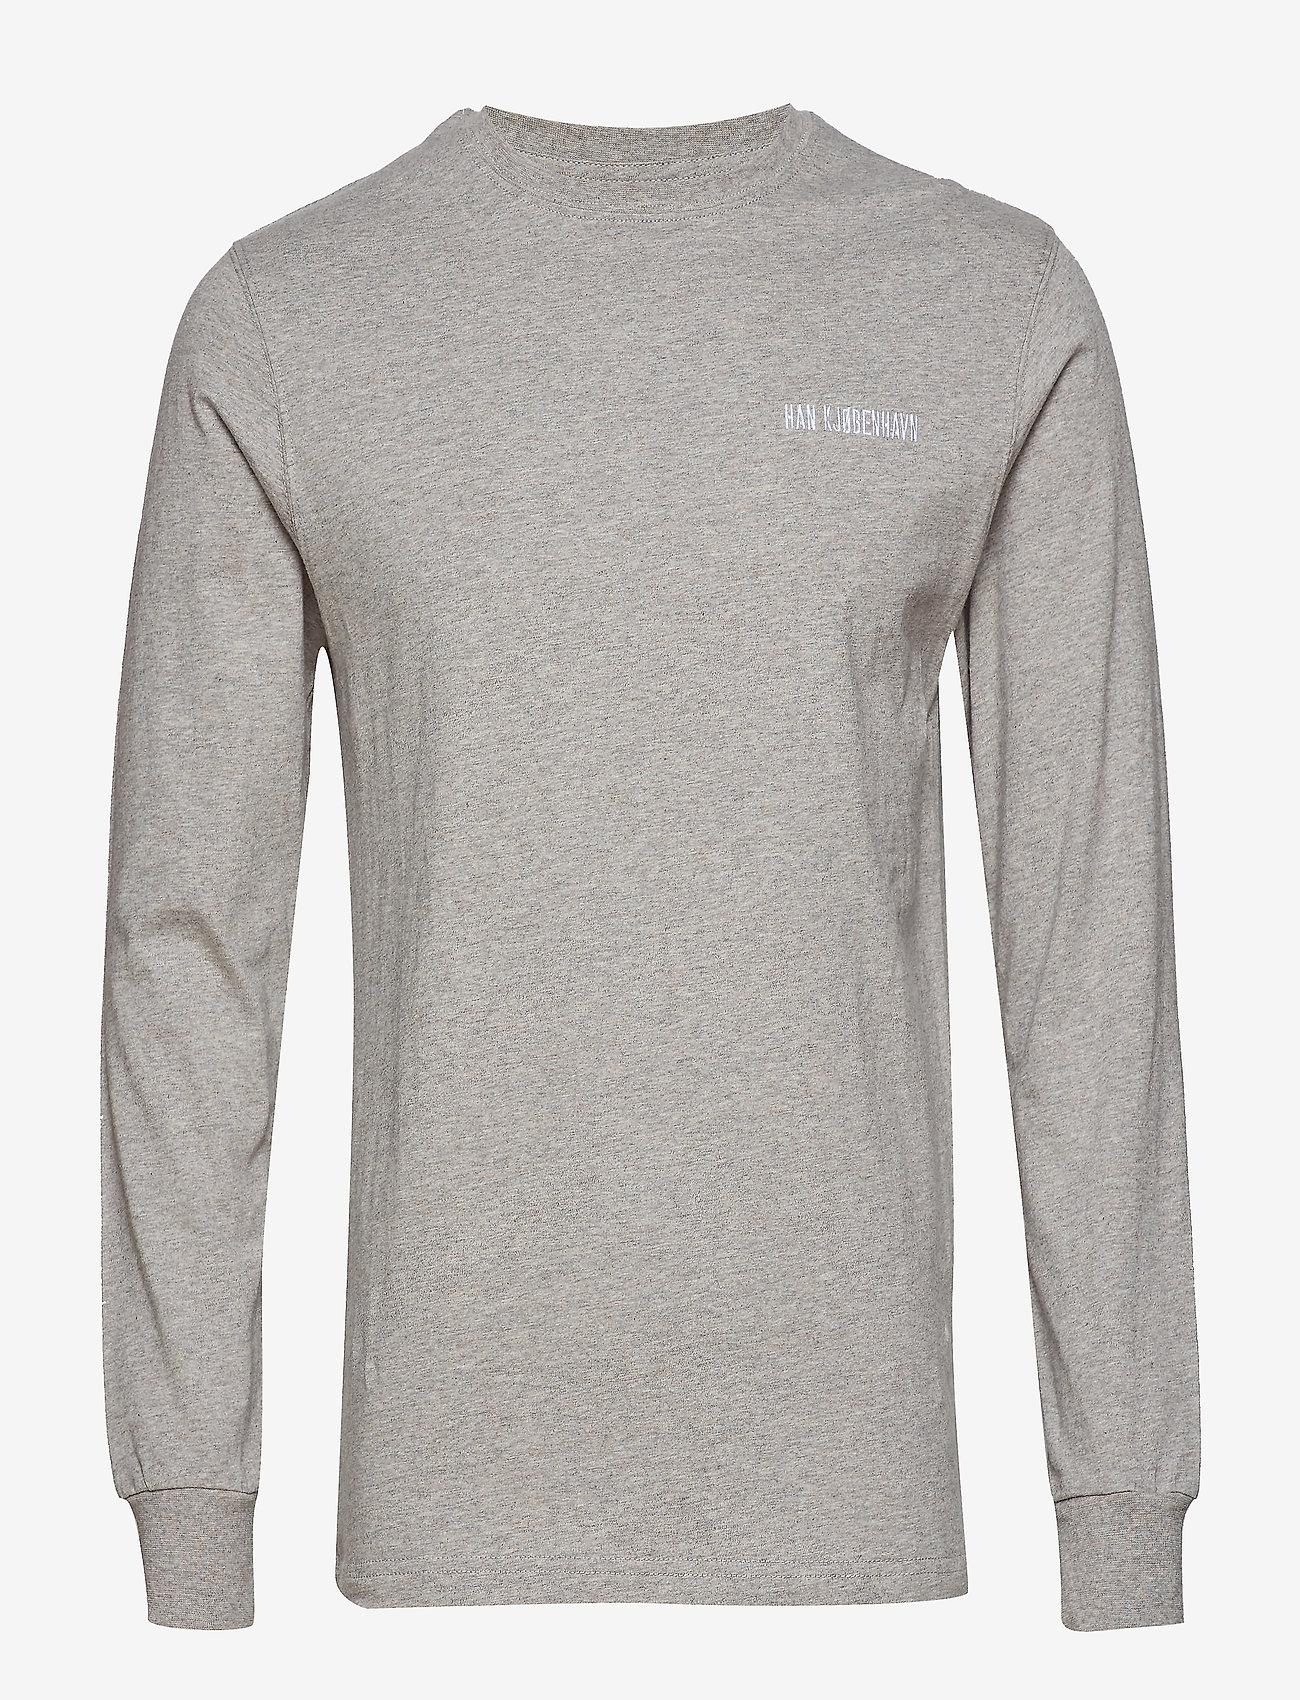 HAN Kjøbenhavn - Casual Long Sleeve Tee - basic t-shirts - grey logo - 1